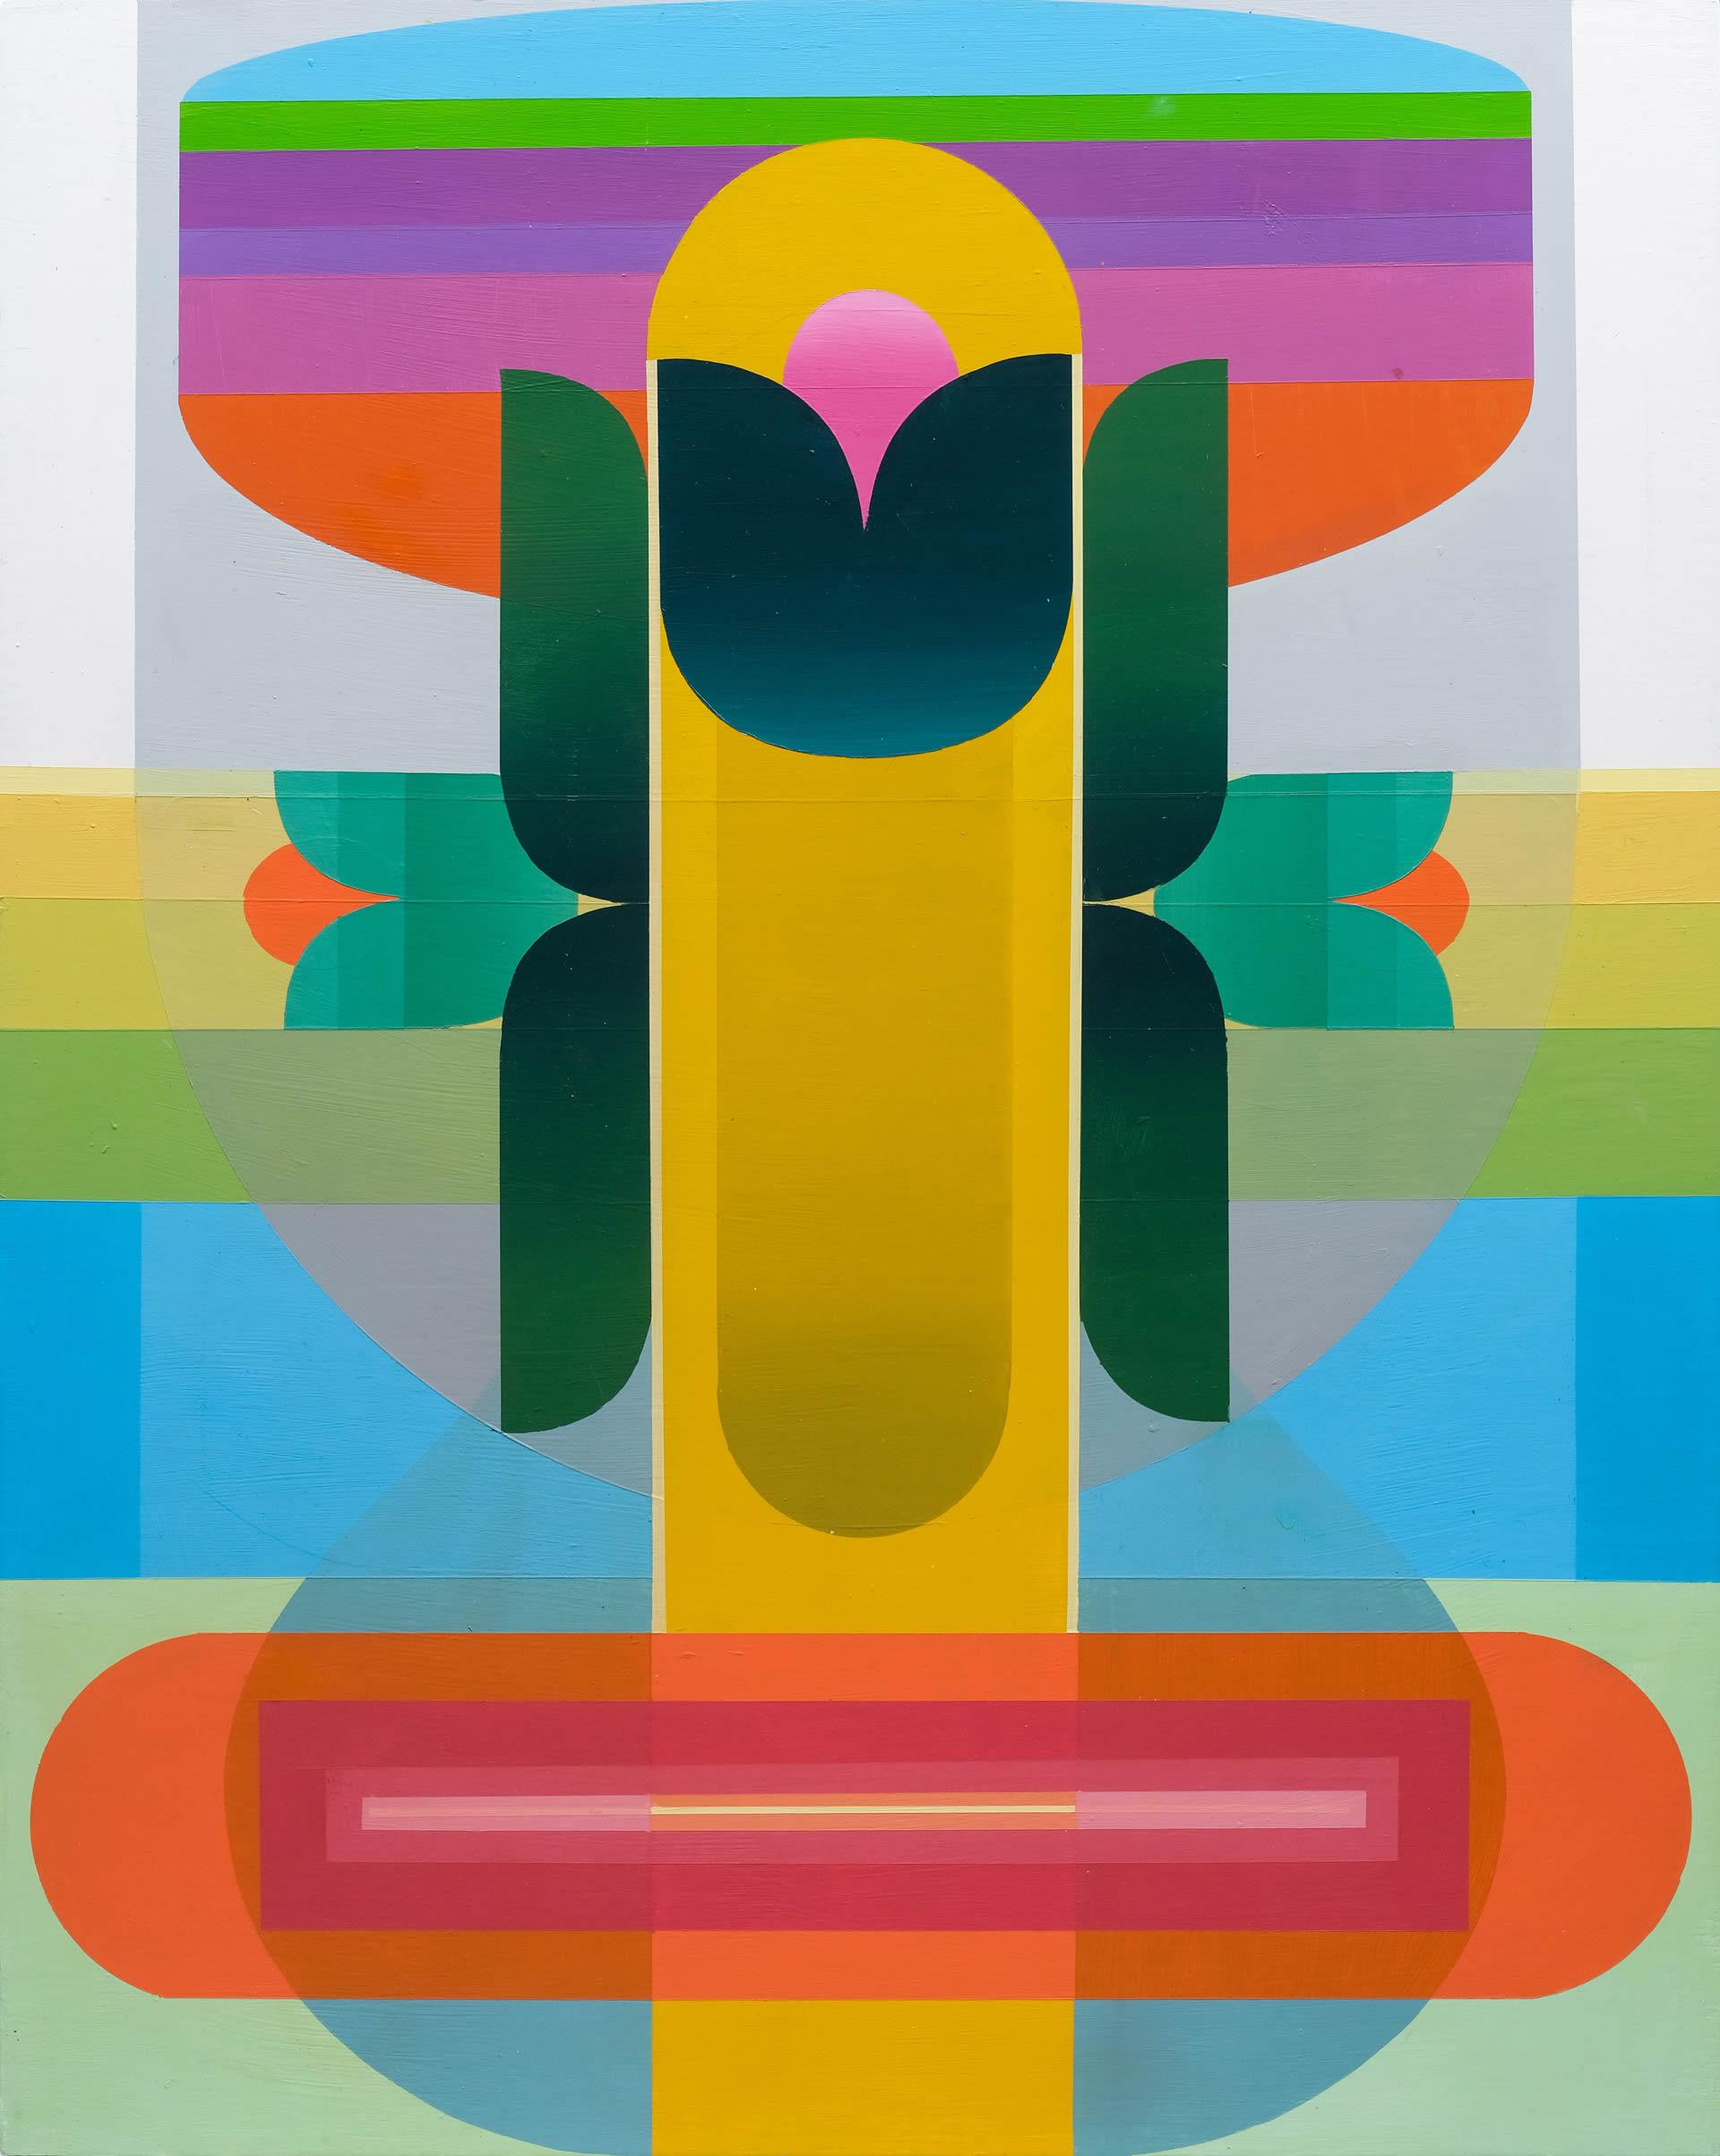 Sarah-Gee-Miller-Optima-1-30x24-Online-Art-Galleries